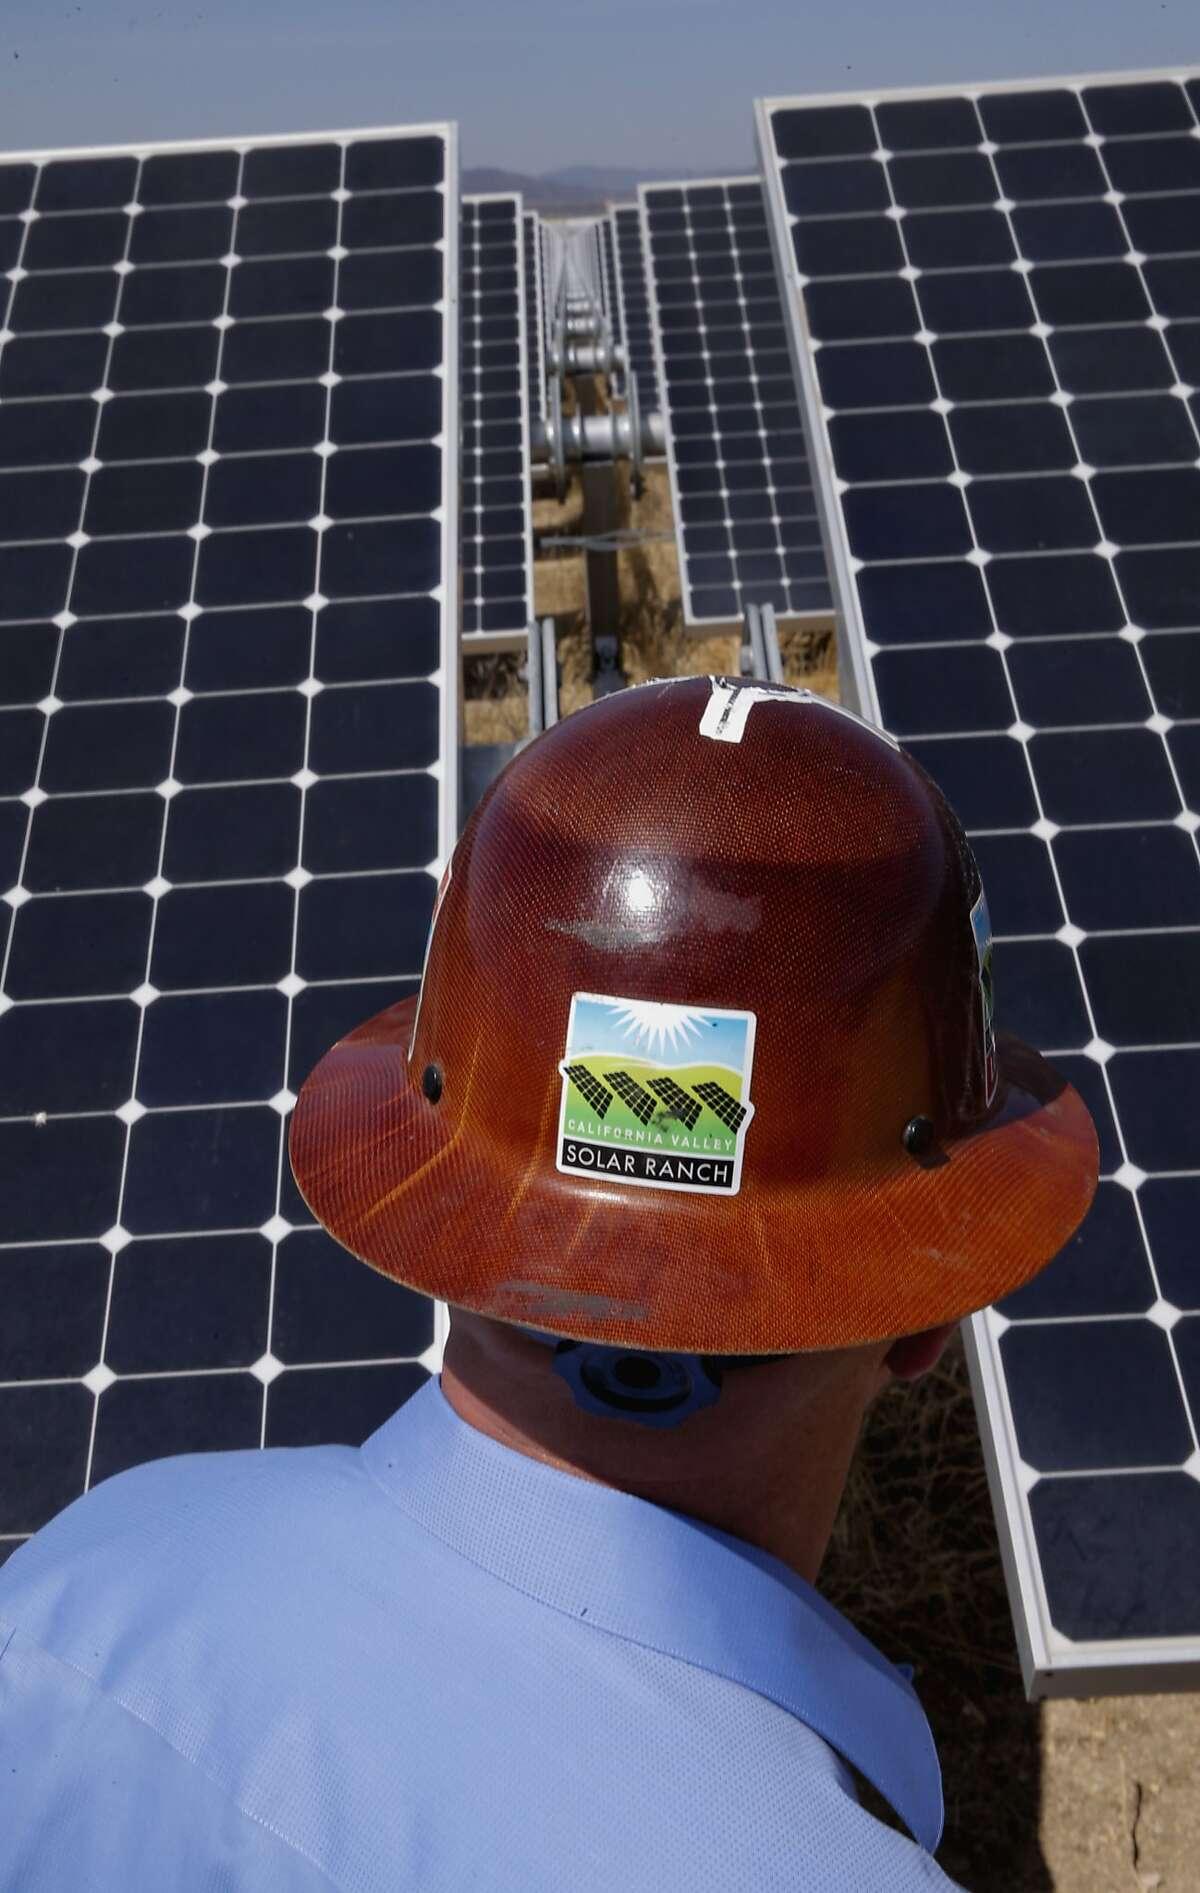 SunPower's west coast operations leader Lance Long walks past a row of solar panels at the California Valley Solar Farm near Santa Margarita, Calif., in San Luis Obispo County, on Fri. August 28, 2015.